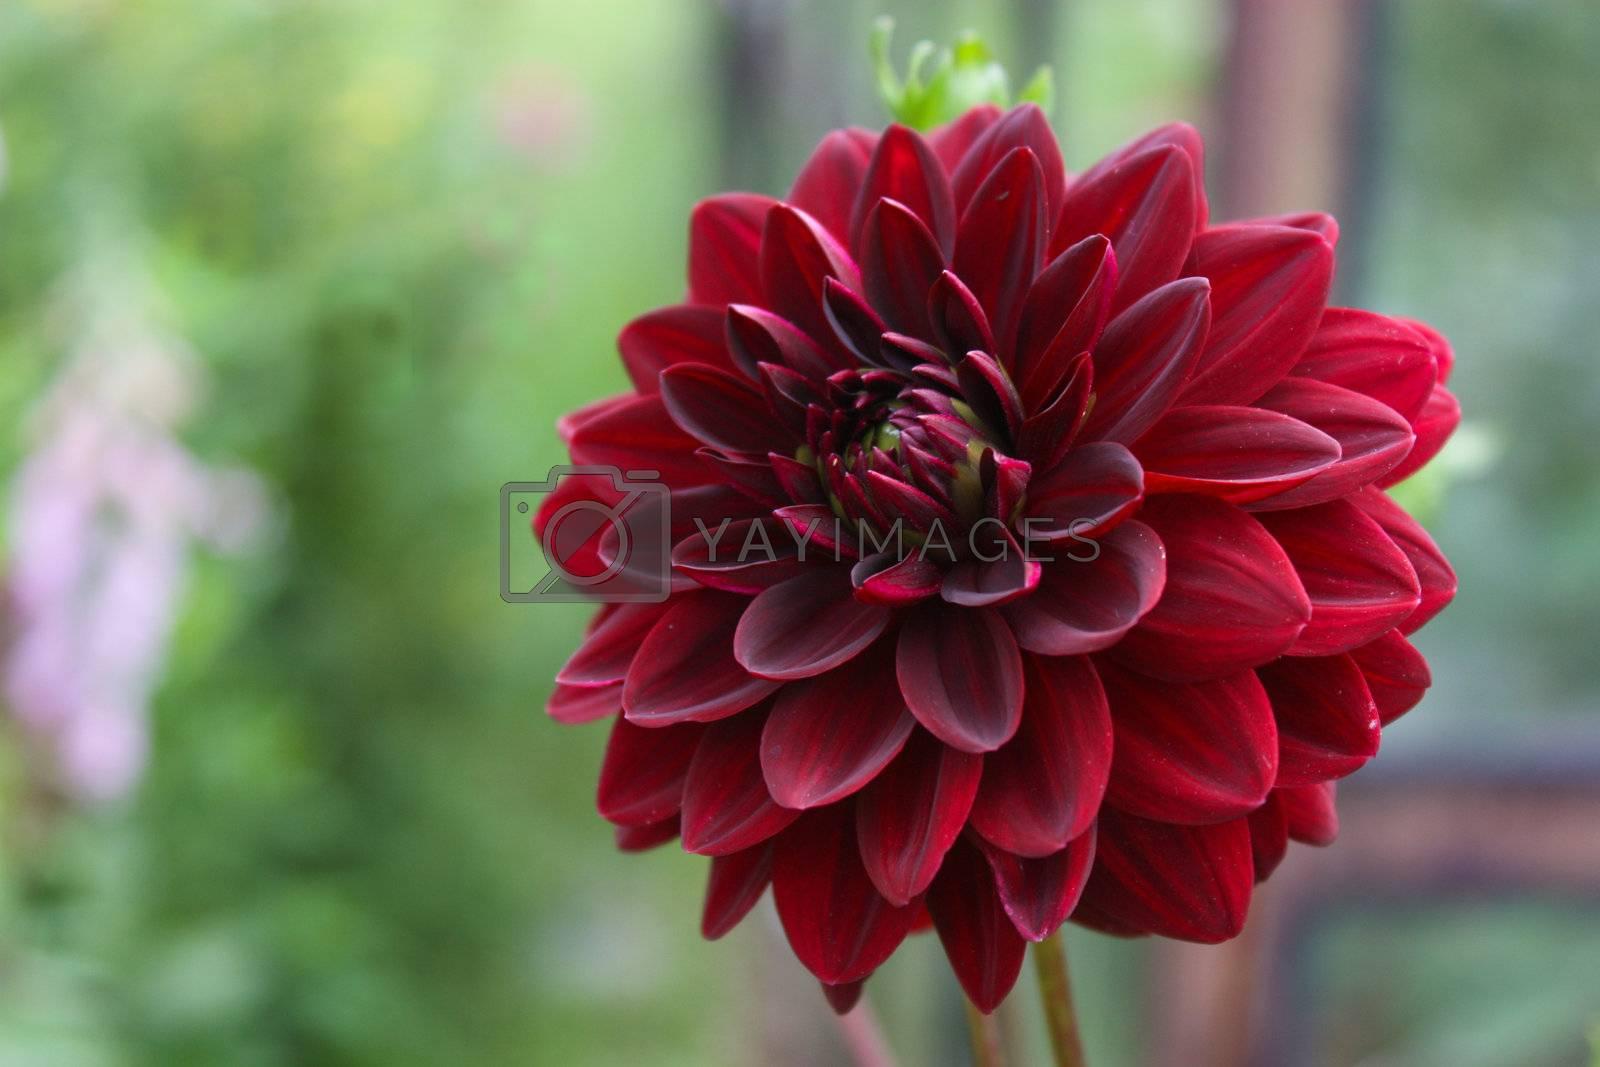 Royalty free image of flower by Lyudmila